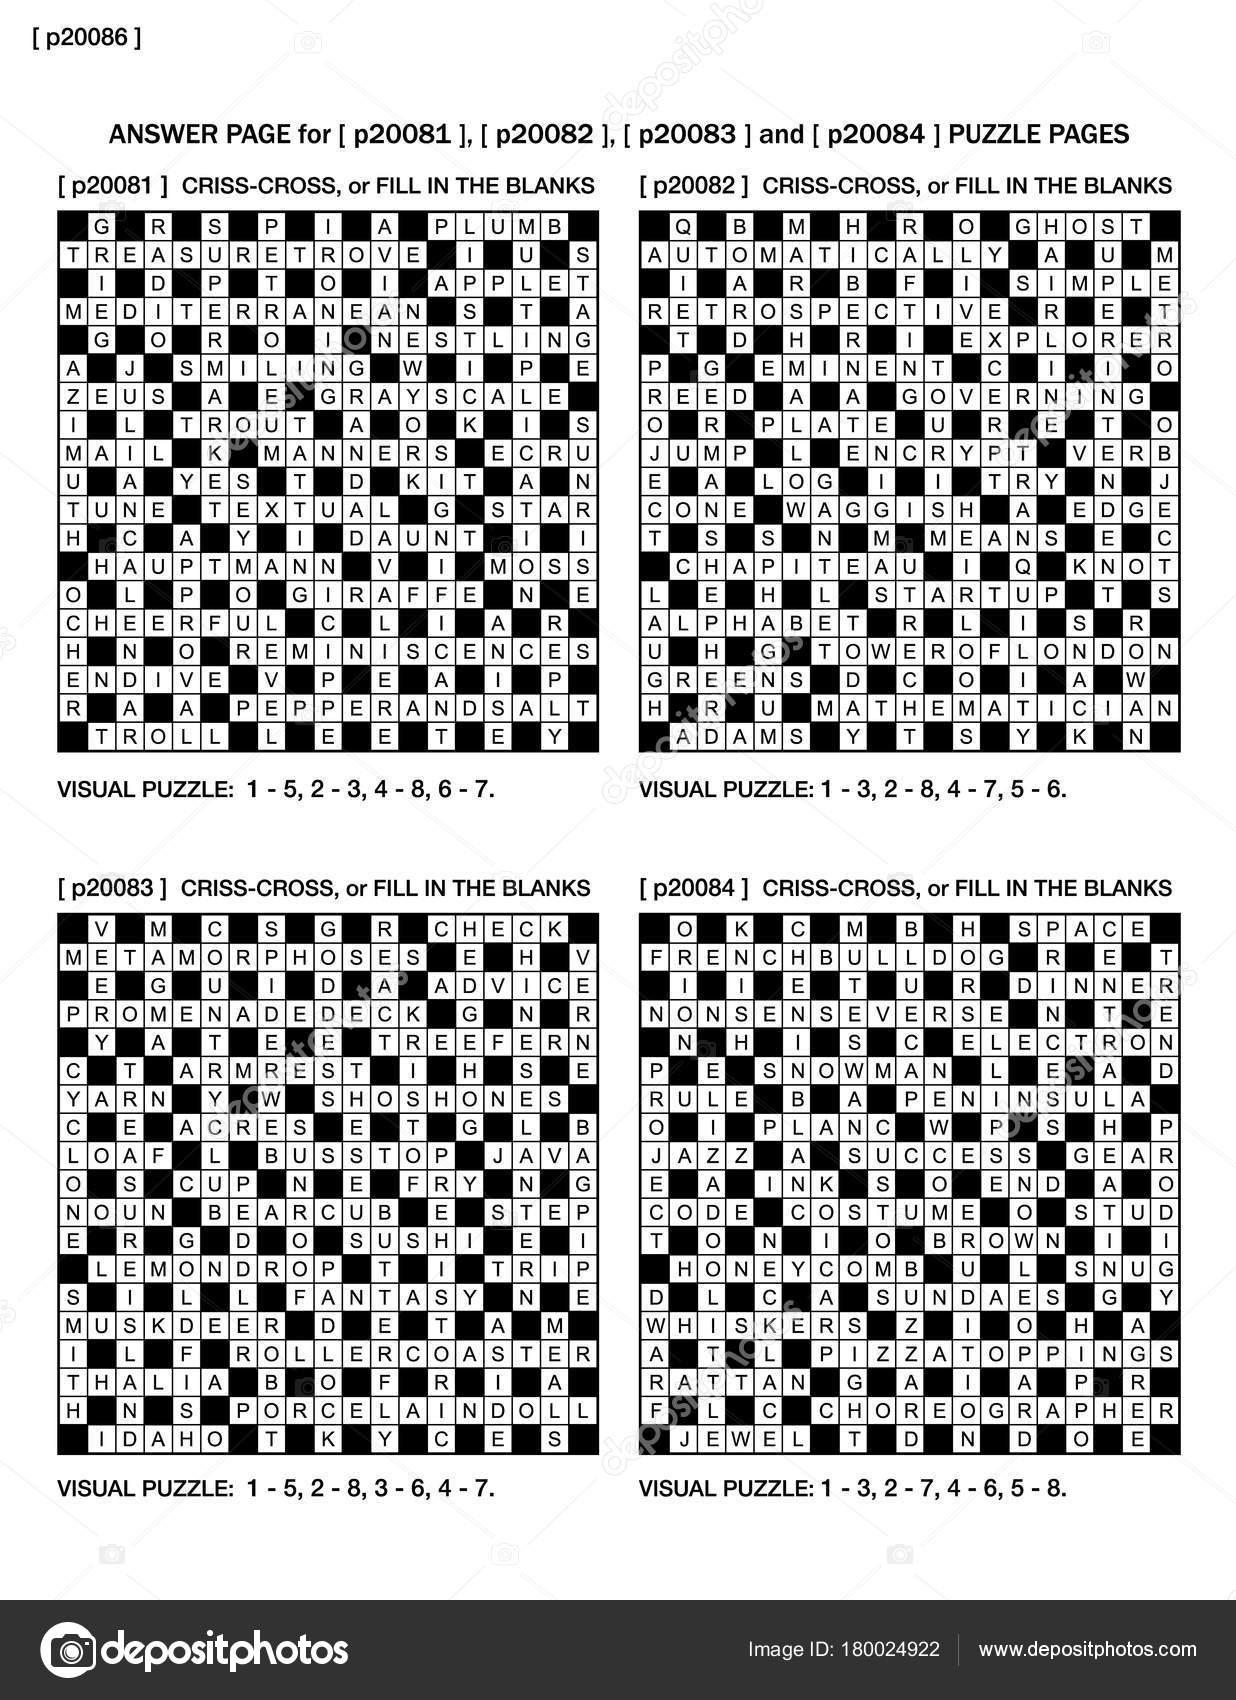 Answer Page Previous Four Puzzle Pages P20081 P20082 P20083